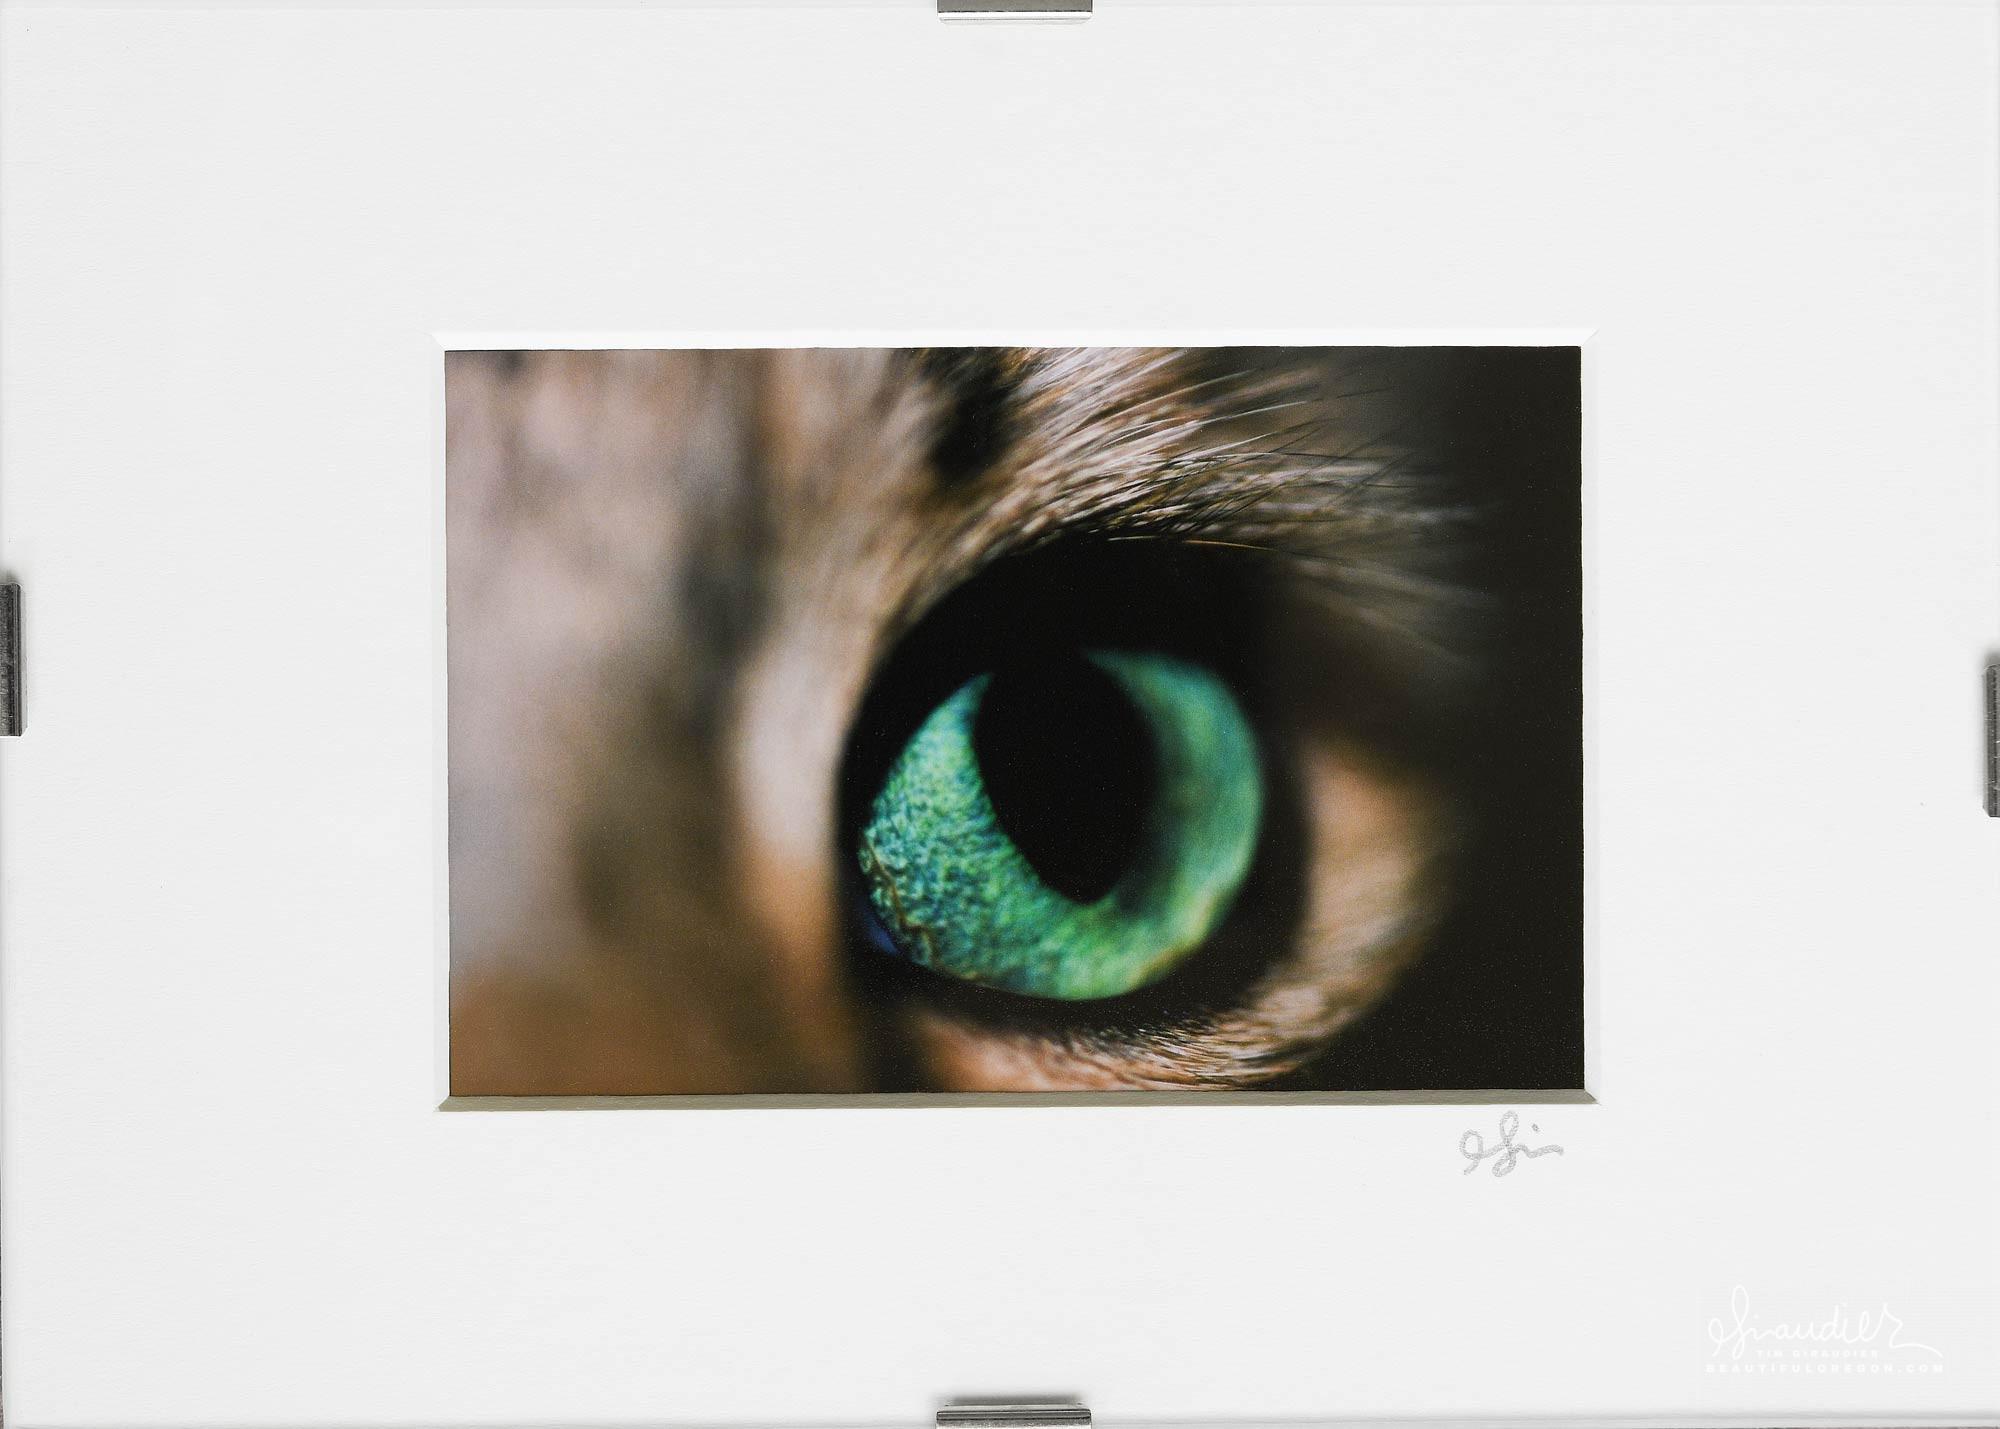 Miko's cat eye